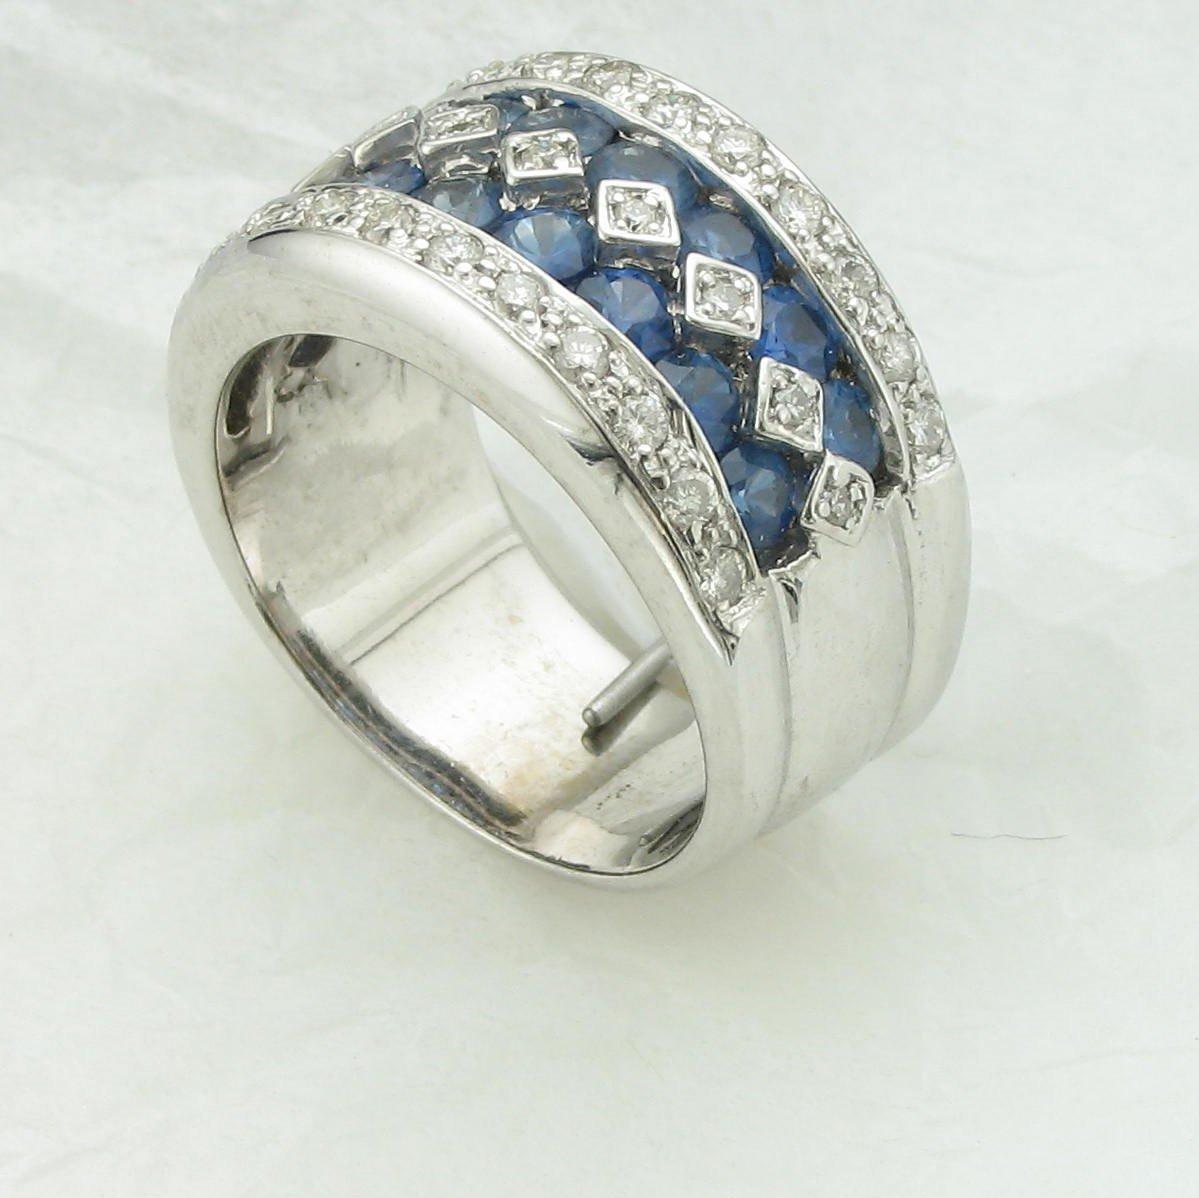 0.75tcw Blue Sapphire/0.25 tcw Diamonds Ring set in 14K White Gold